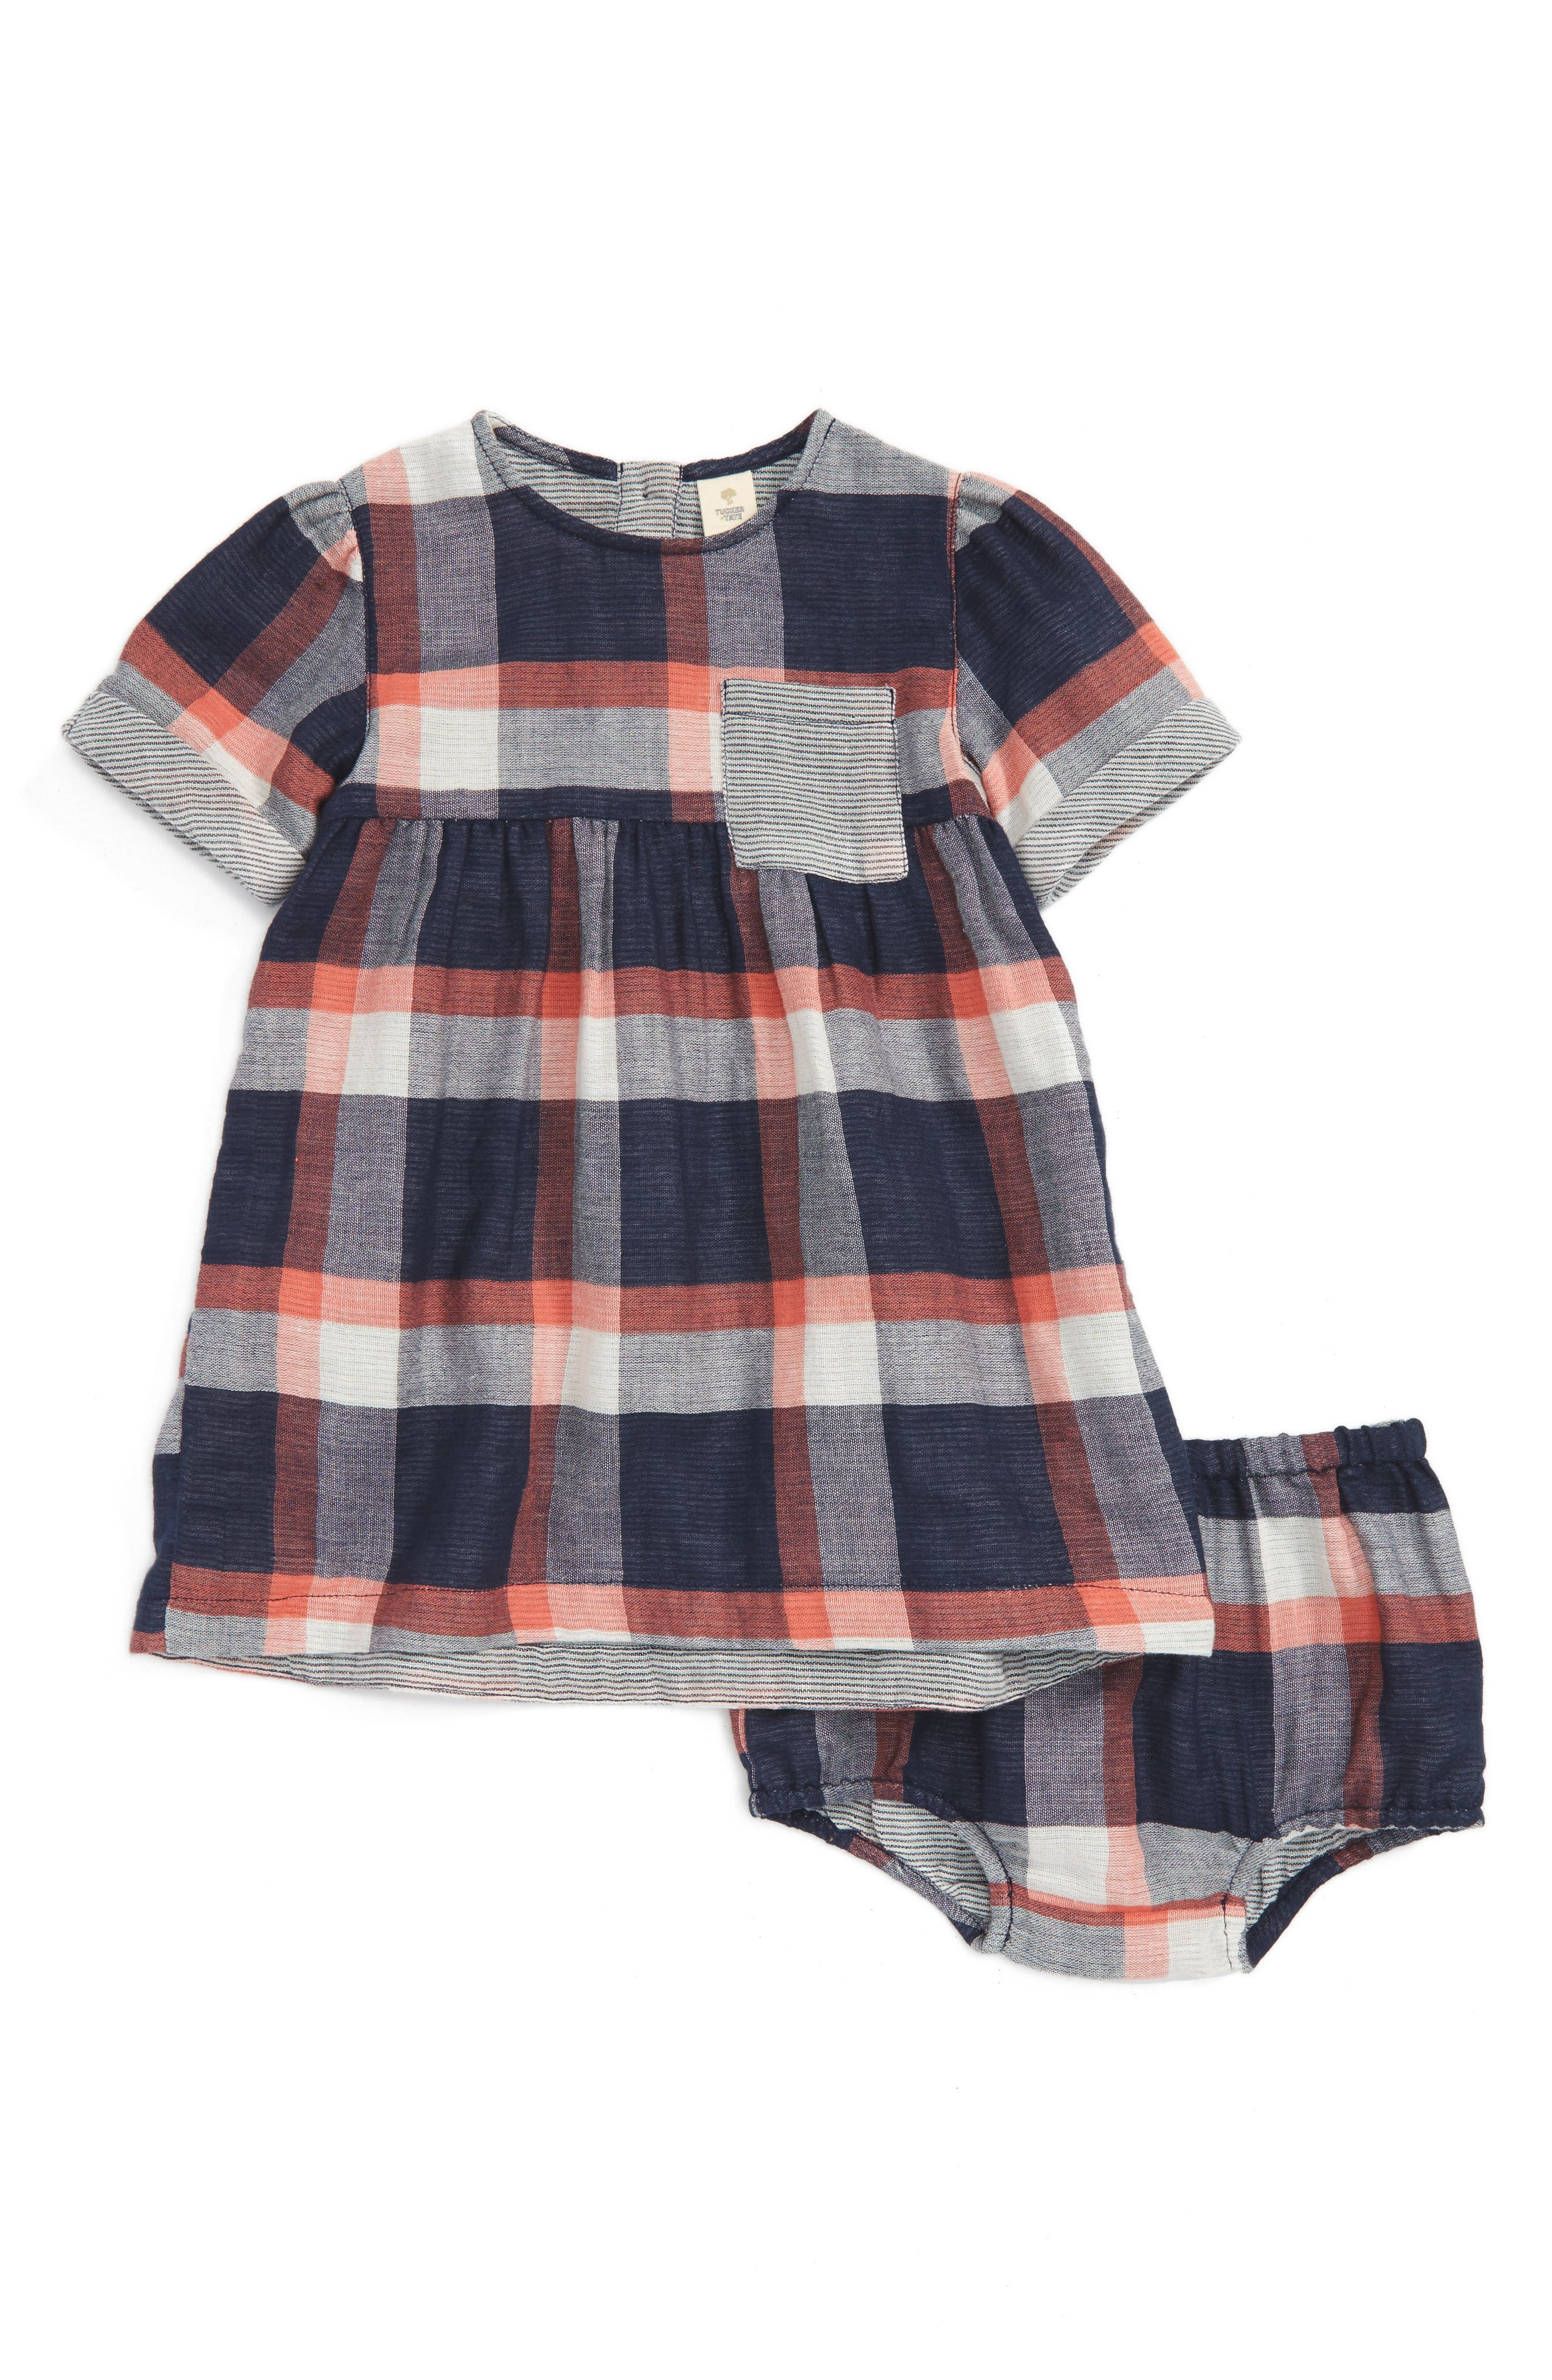 Main Image - Tucker + Tate Plaid Short Sleeve Dress (Baby Girls)